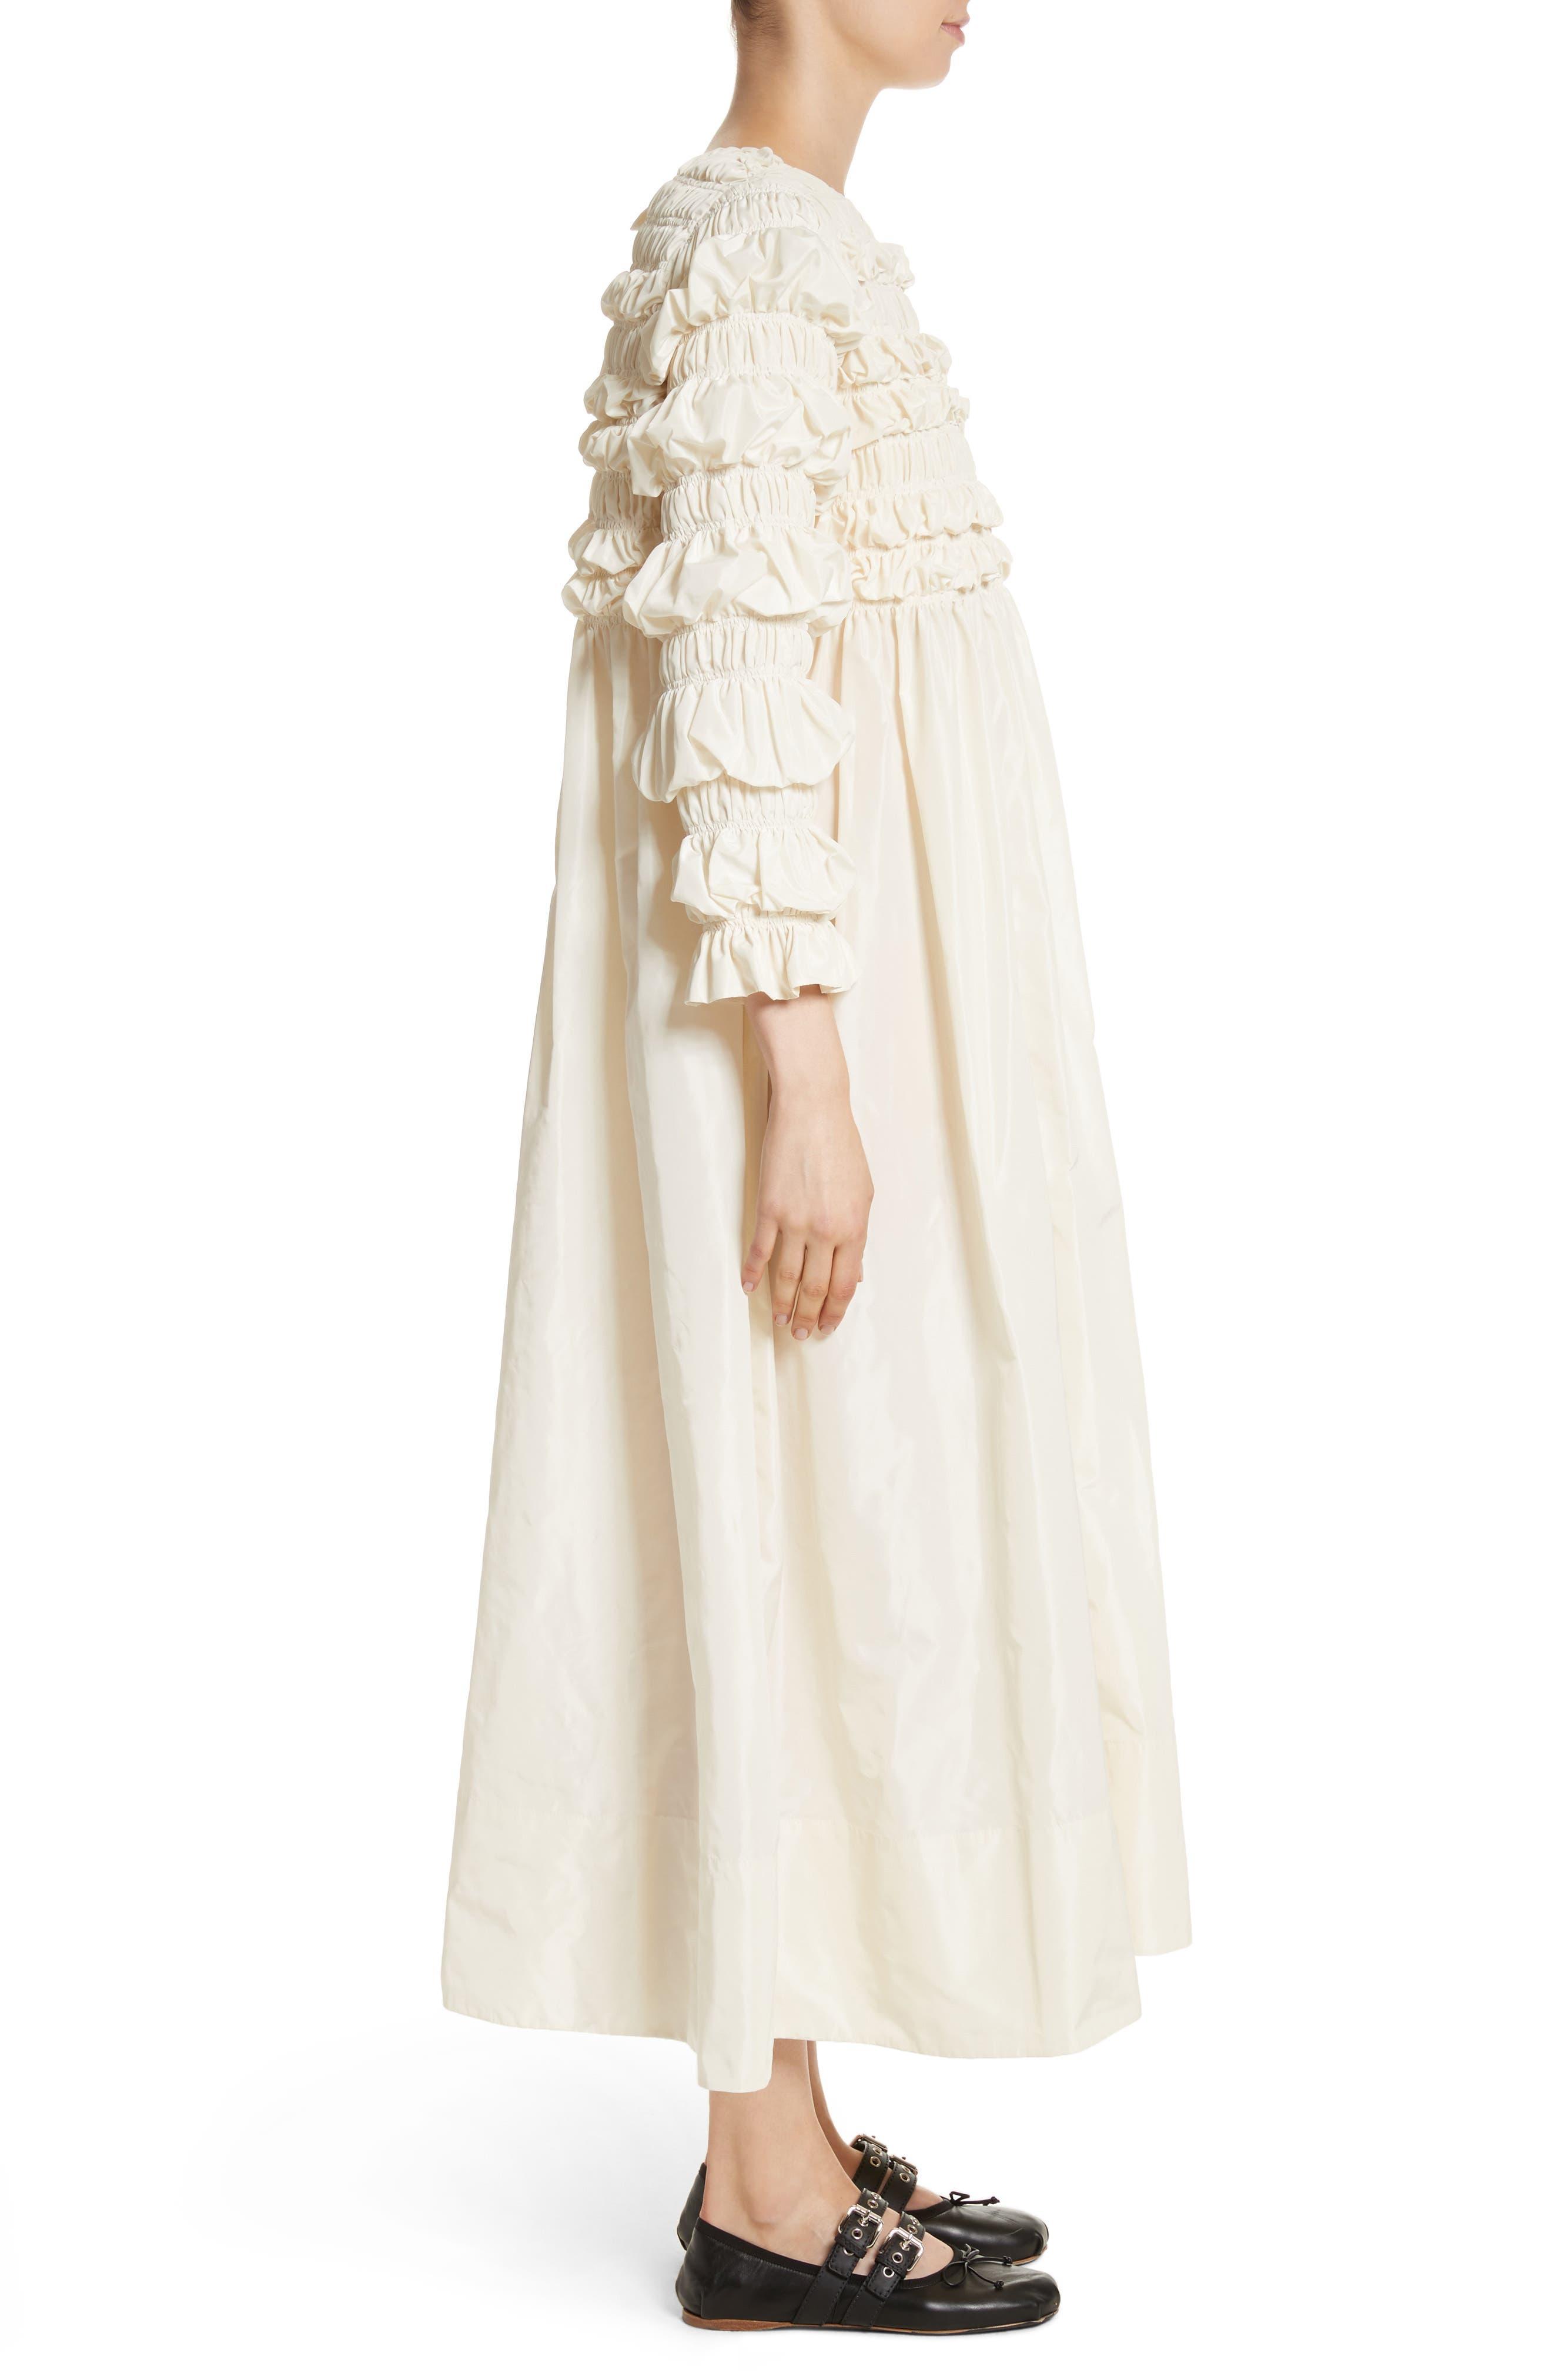 Lizzie Ruffled Taffeta Dress,                             Alternate thumbnail 3, color,                             900